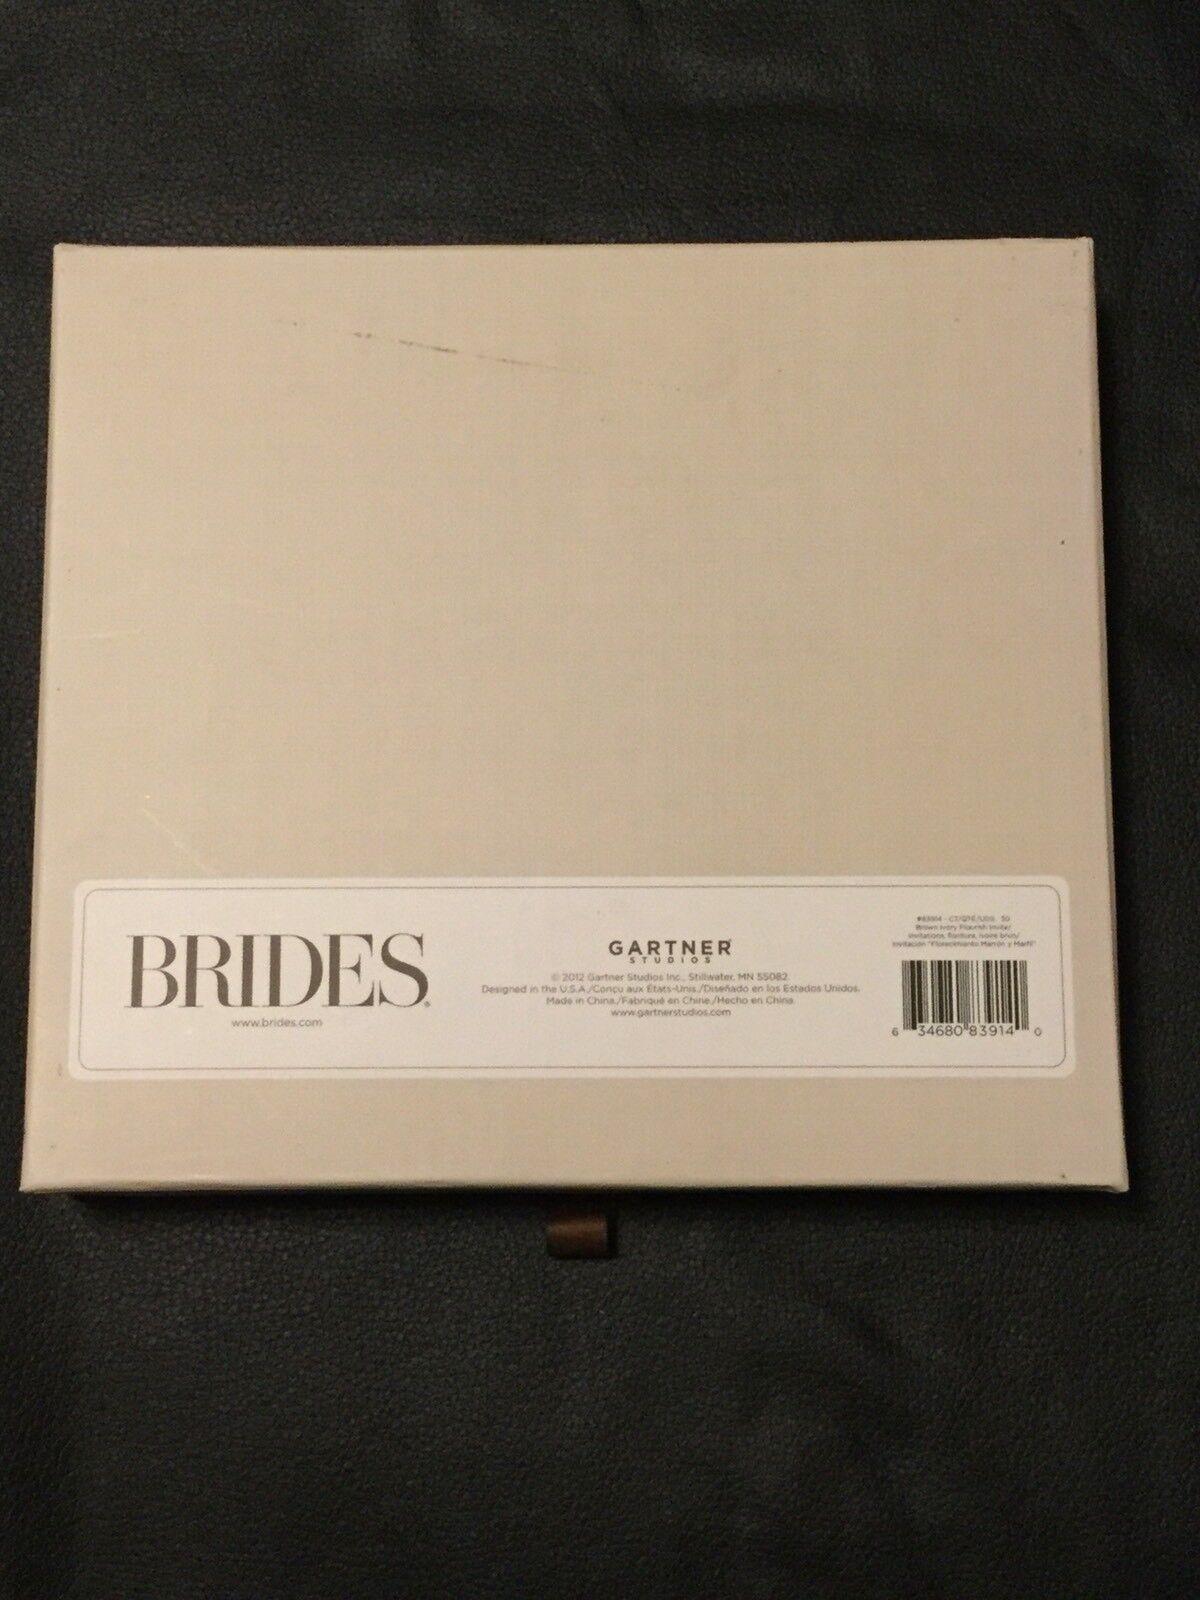 Gartner Studios Diy Brides Deluxe Wedding Invitation Kit 30 Ct Brown